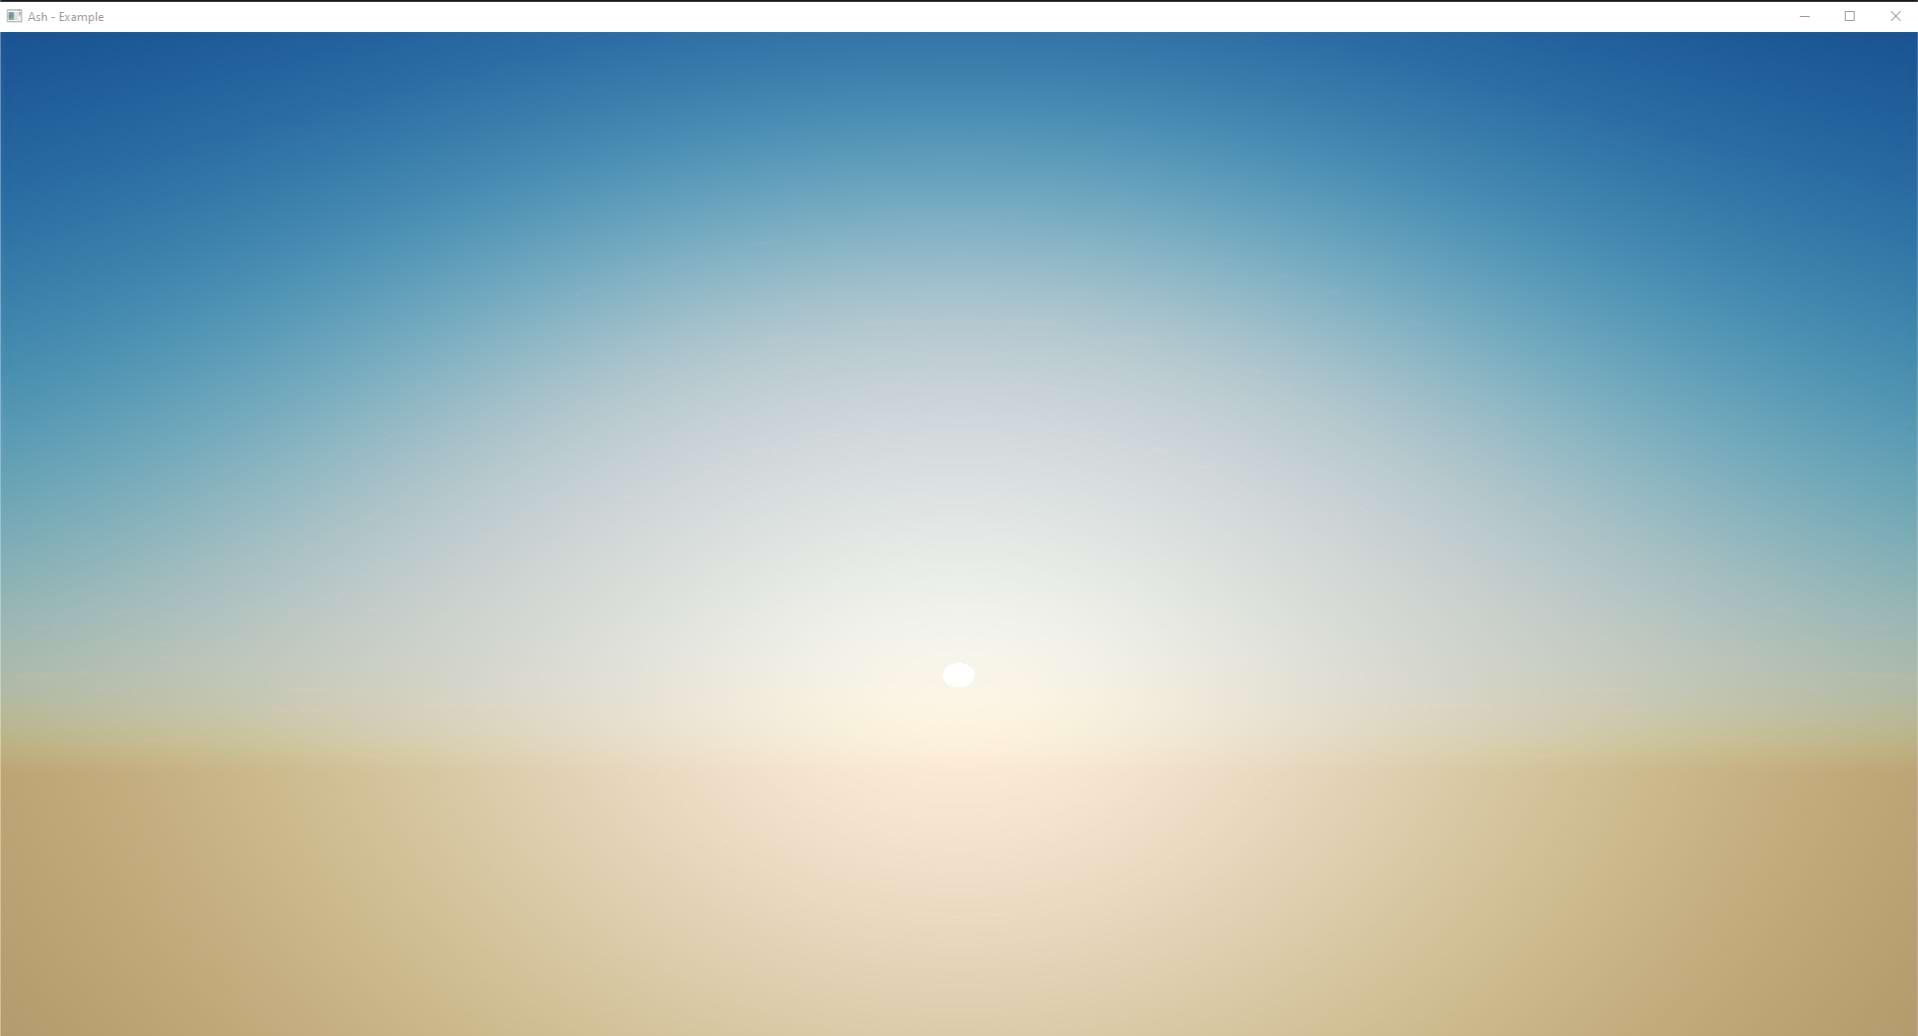 Sky shader